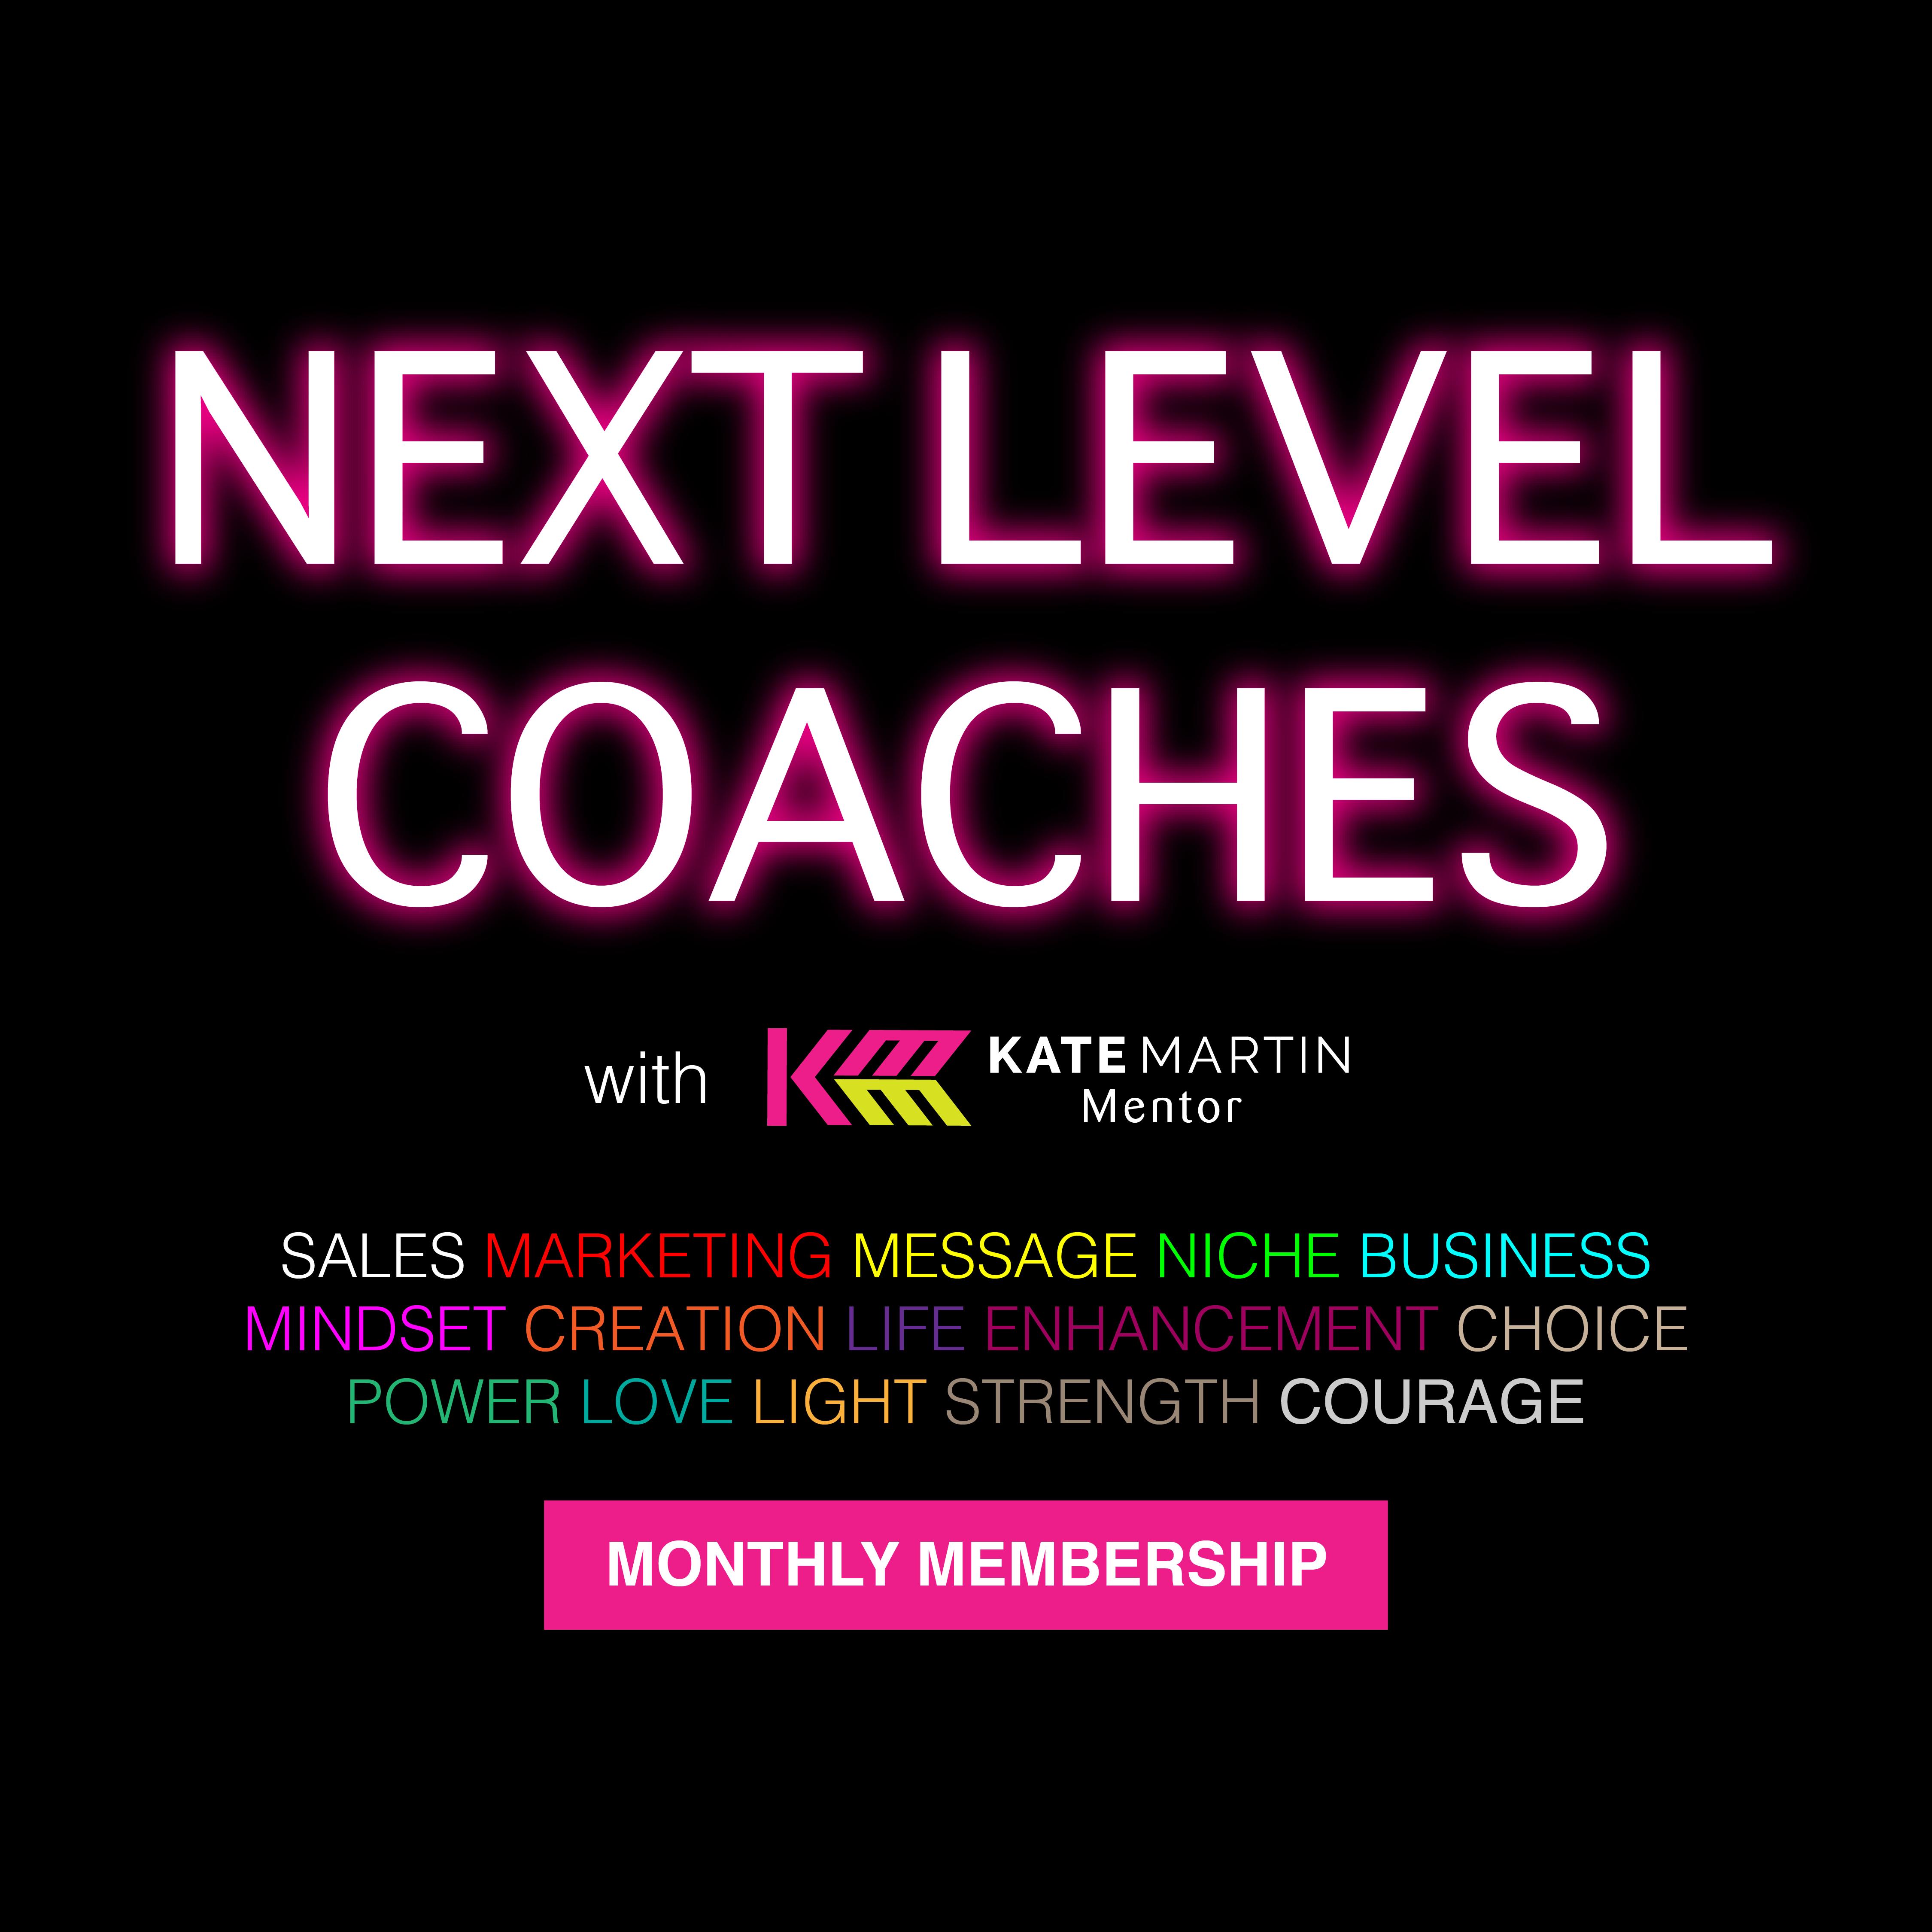 next level coaches